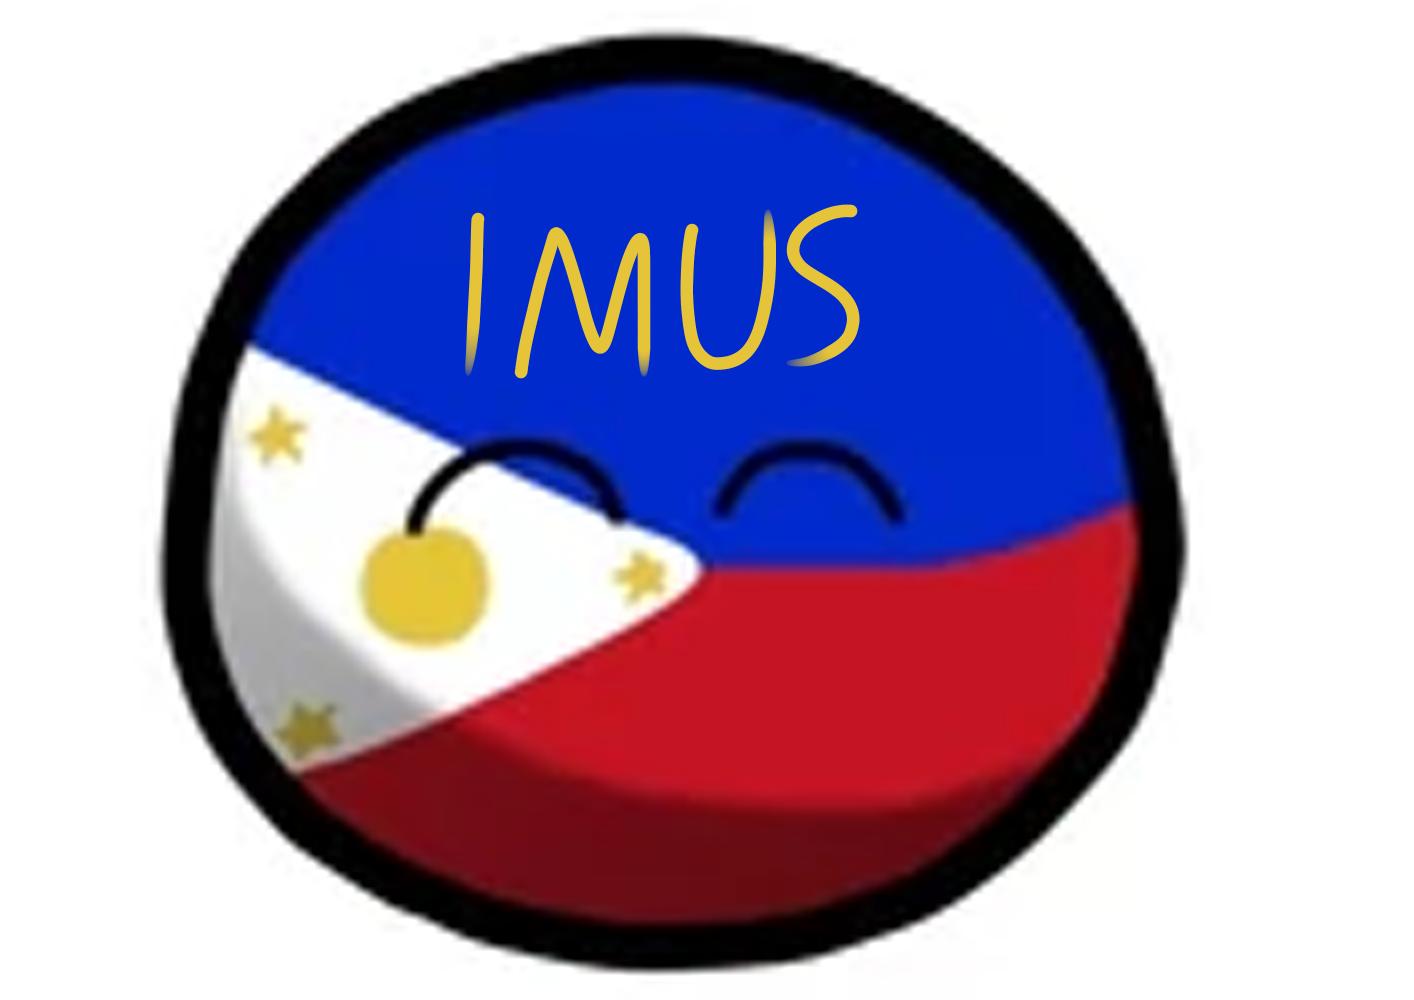 Imusball